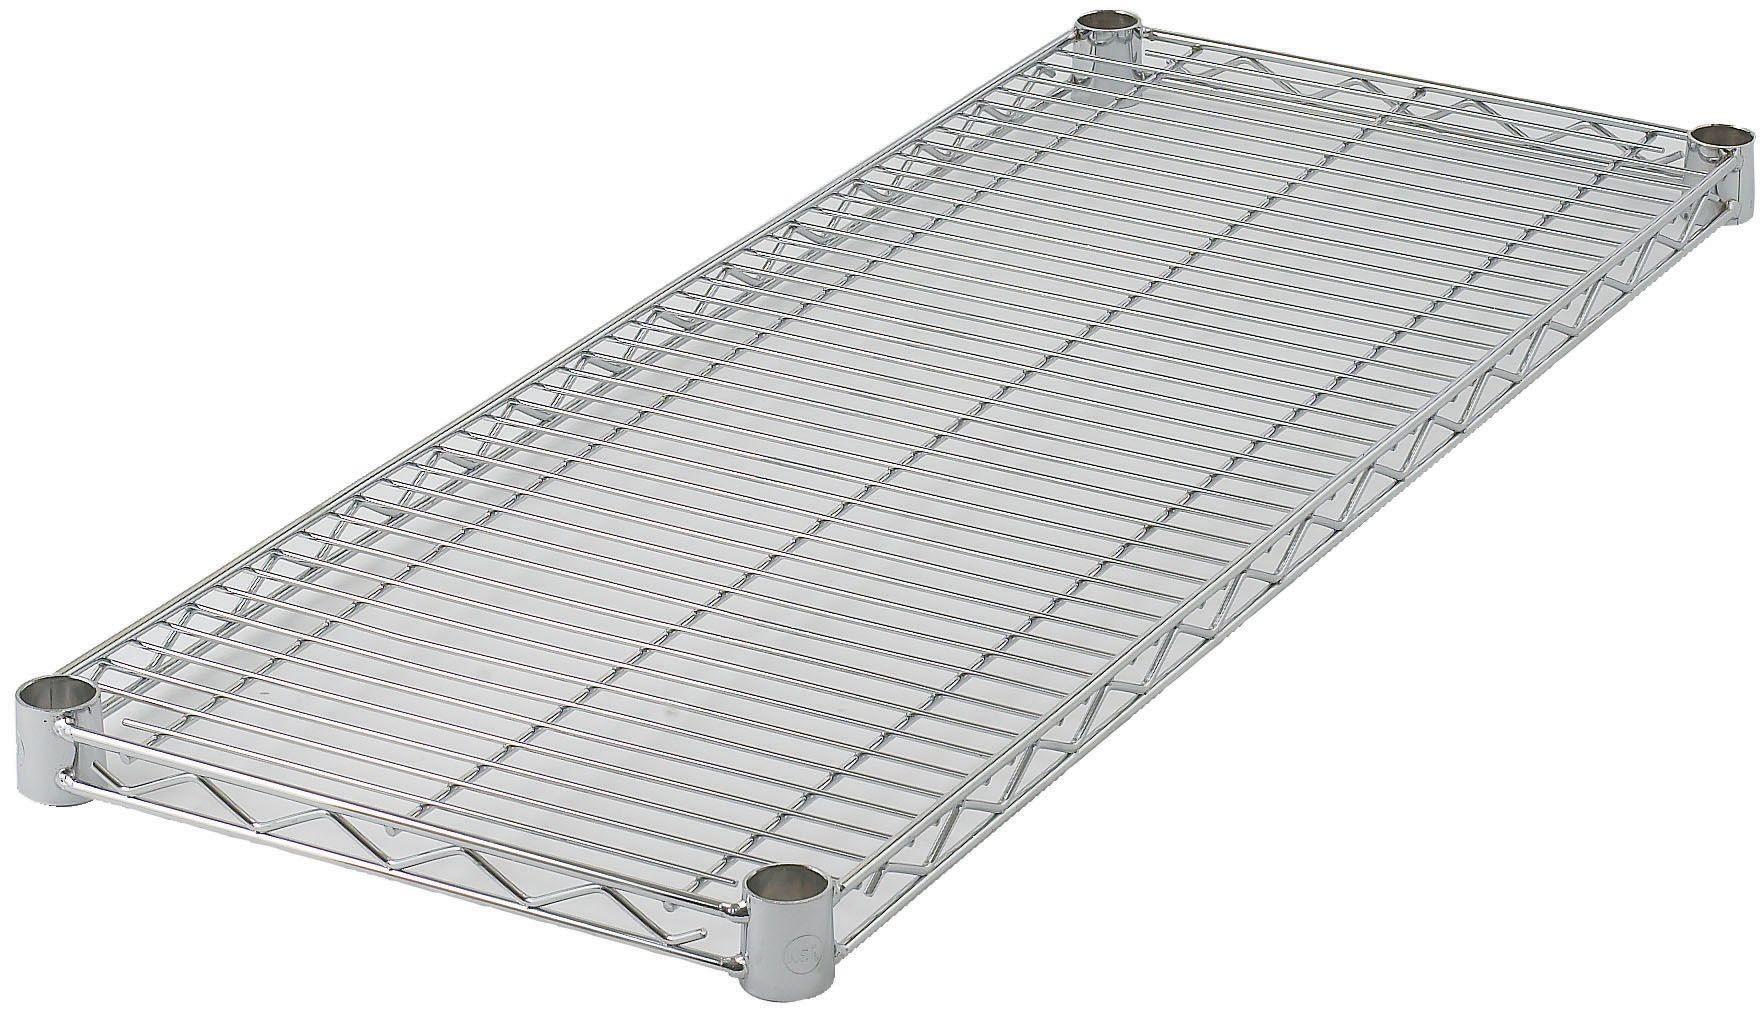 "Winco VC-1824 Chrome-Plated Wire Shelf 18"" x 24"""